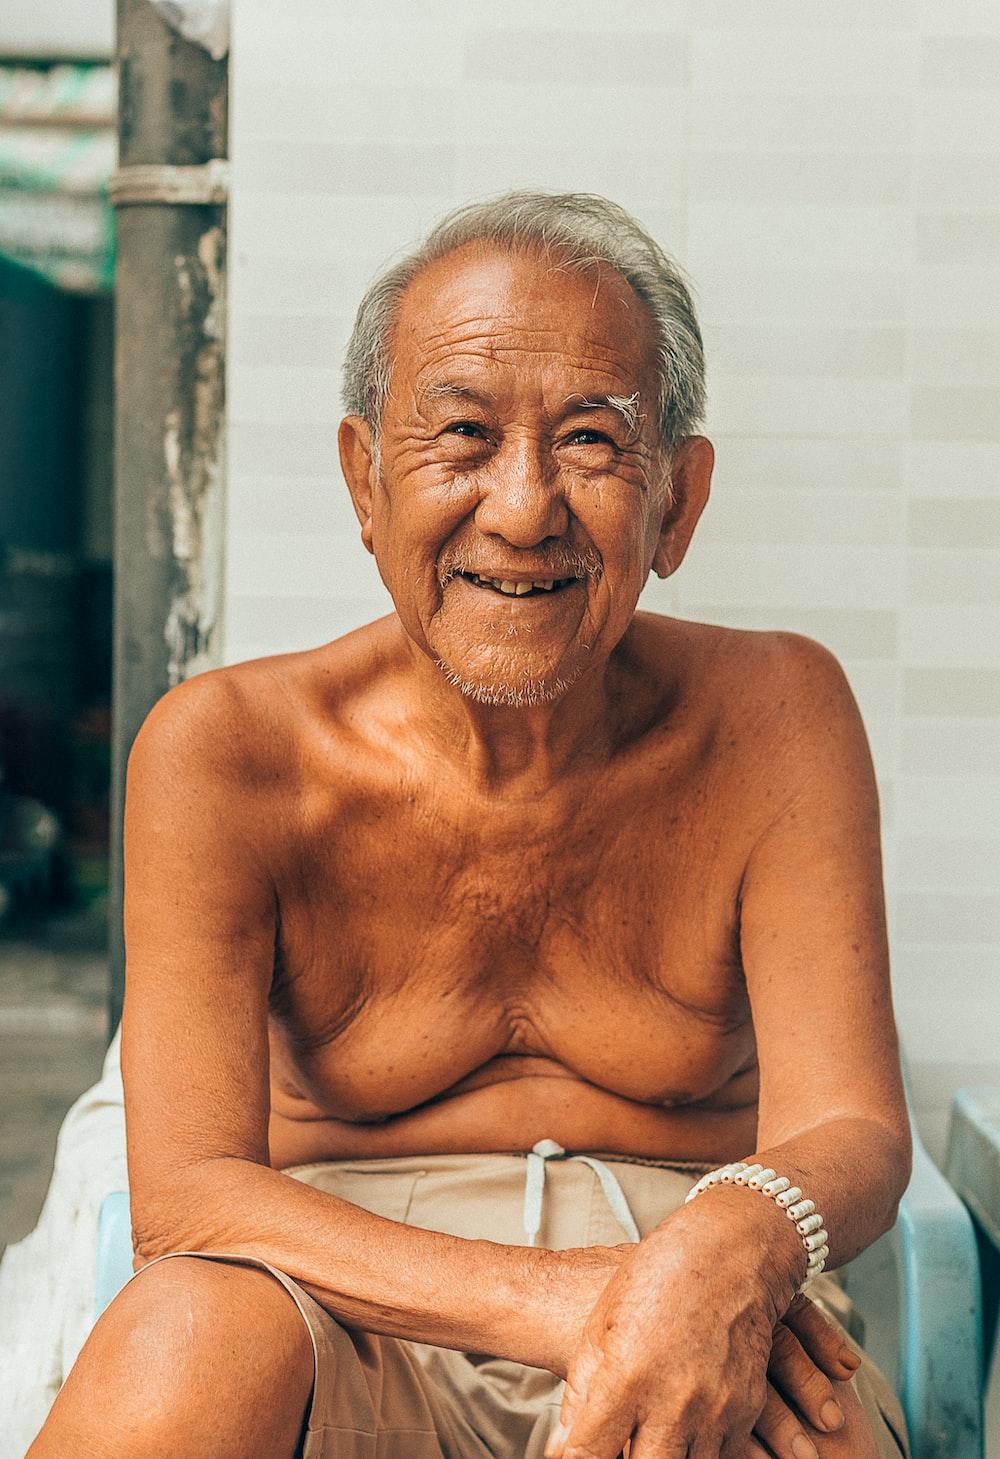 man wearing grey shorts sitting on chair